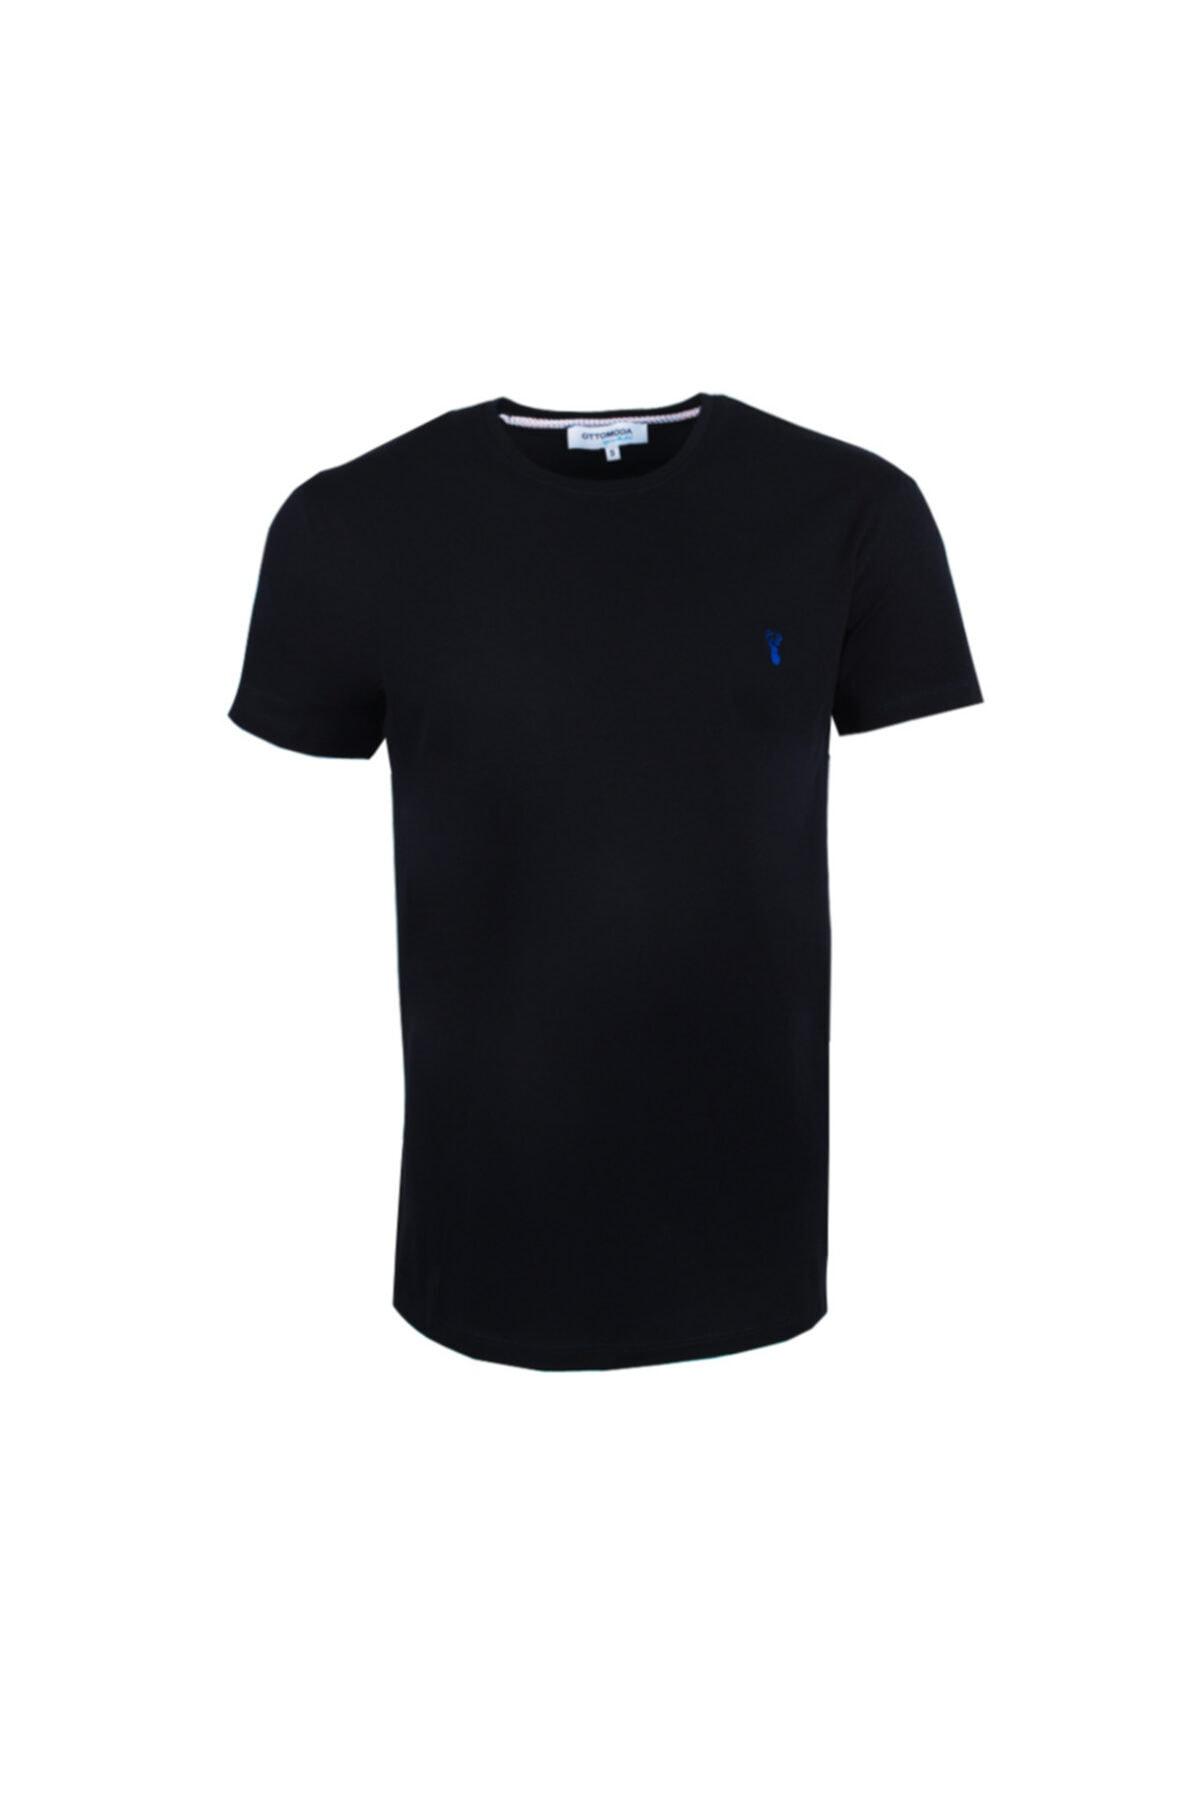 Ottomoda Erkek T-shirt Lacivert 1